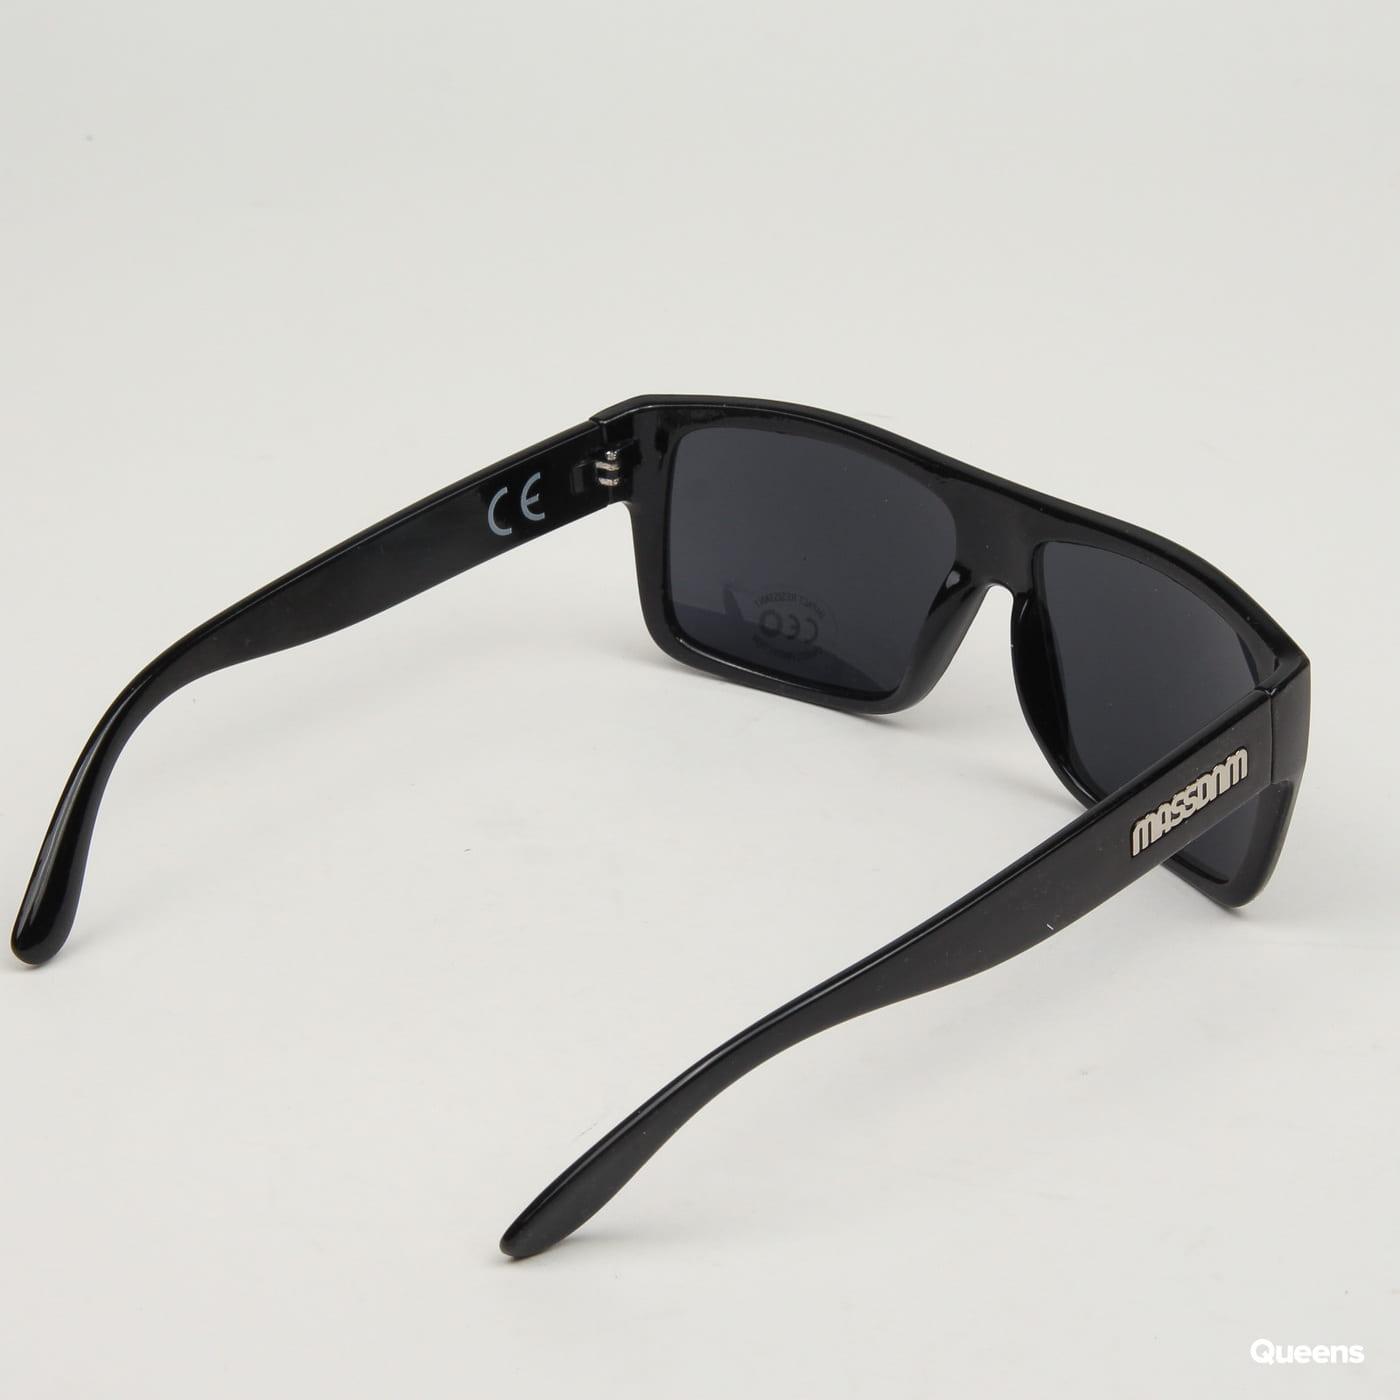 Mass DNM Icon Sunglasses black satin